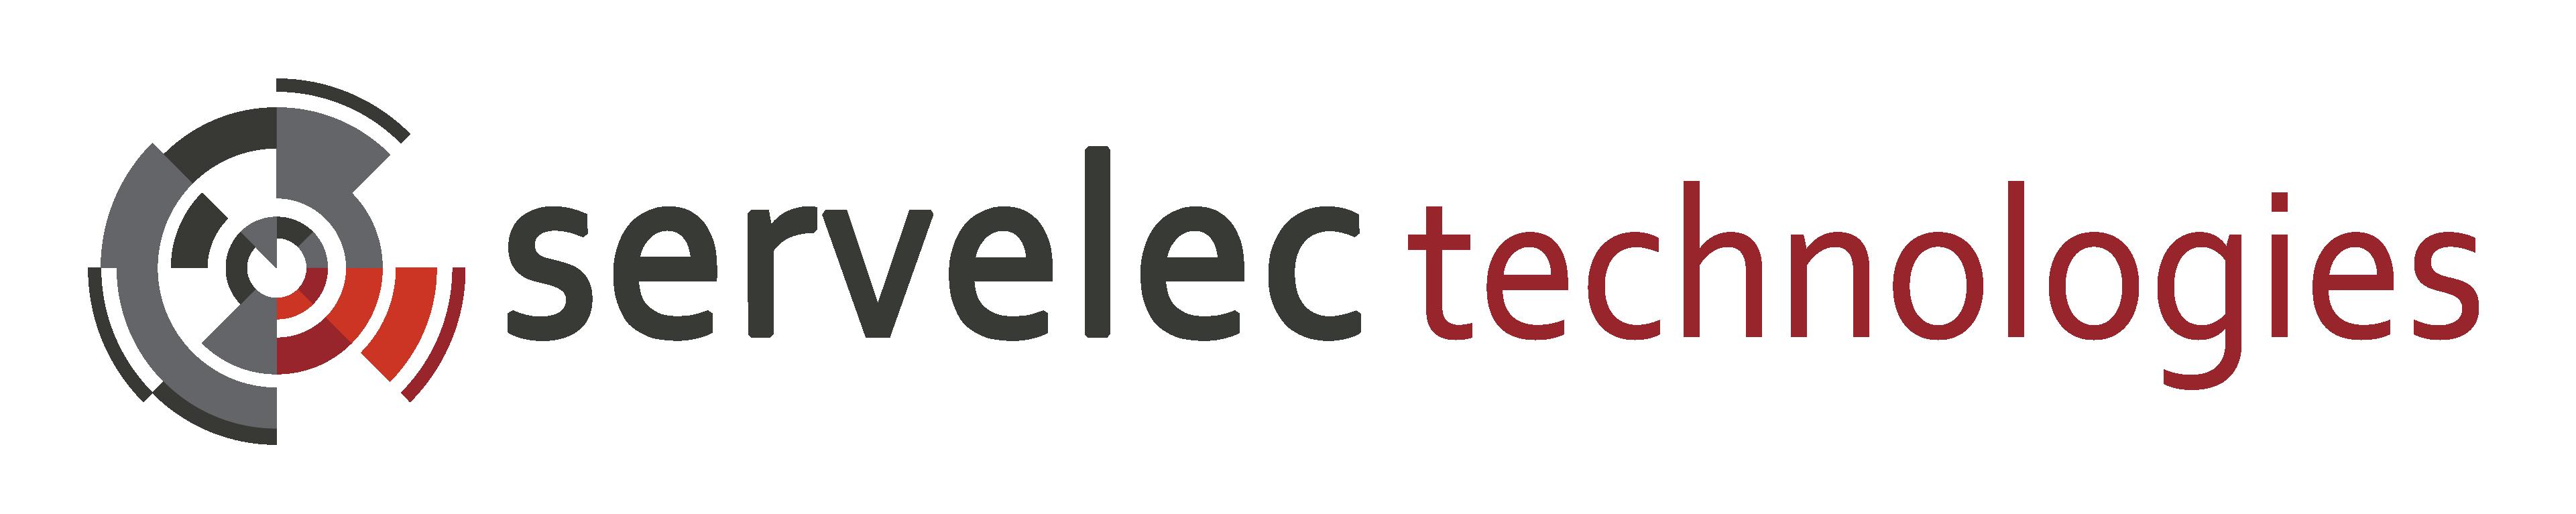 https://campaign-image.com/zohocampaigns/513263000000442004_zc_v9_servelec_primary_logo_technologies.png